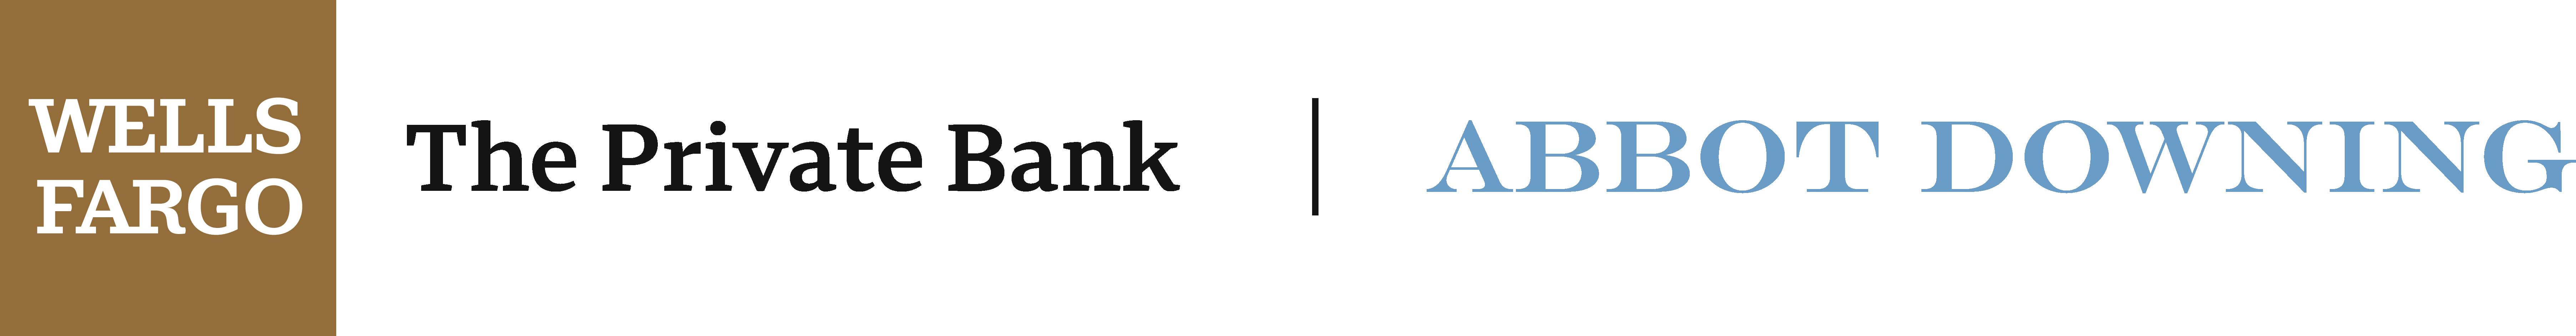 TPB-AD-dual-brand-logo-selfless-love-foundation-gala-sponsor